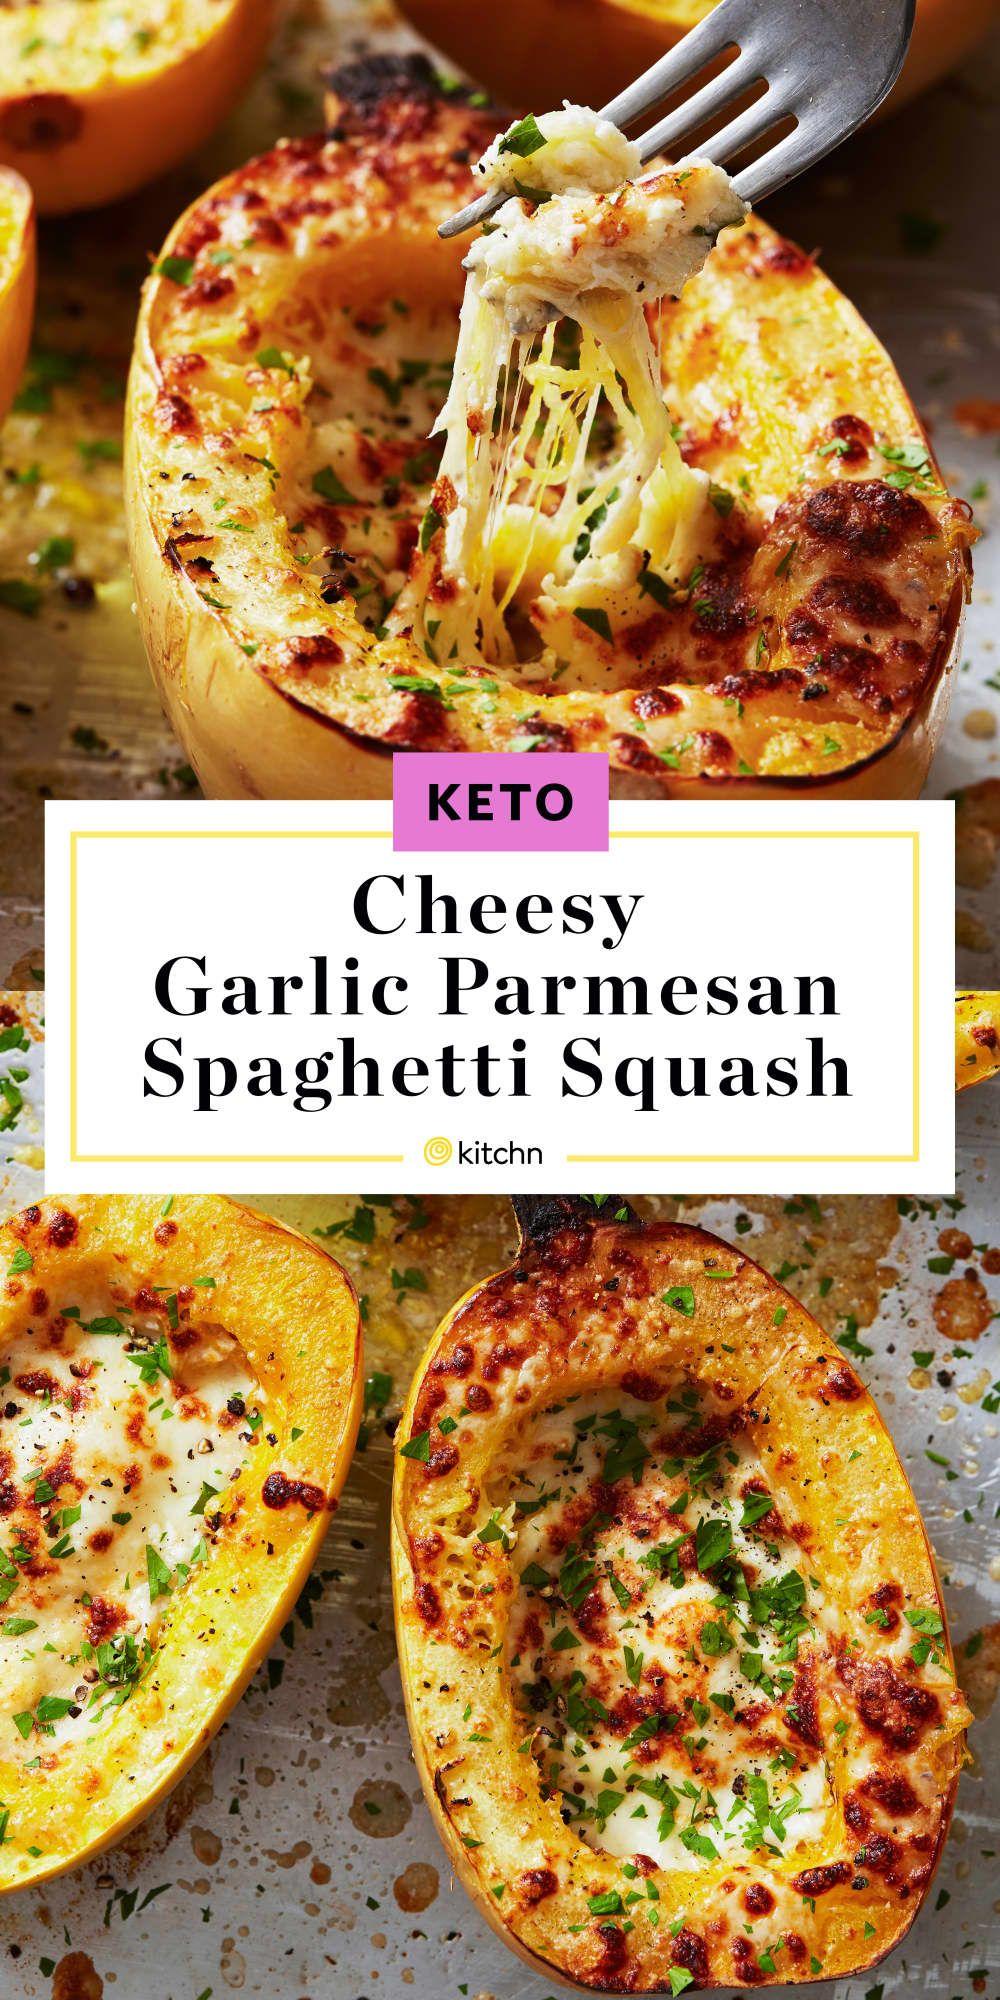 Cheesy Garlic Parmesan Spaghetti Squash Is the Ultimate Keto Side #stuffedspaghettisquash